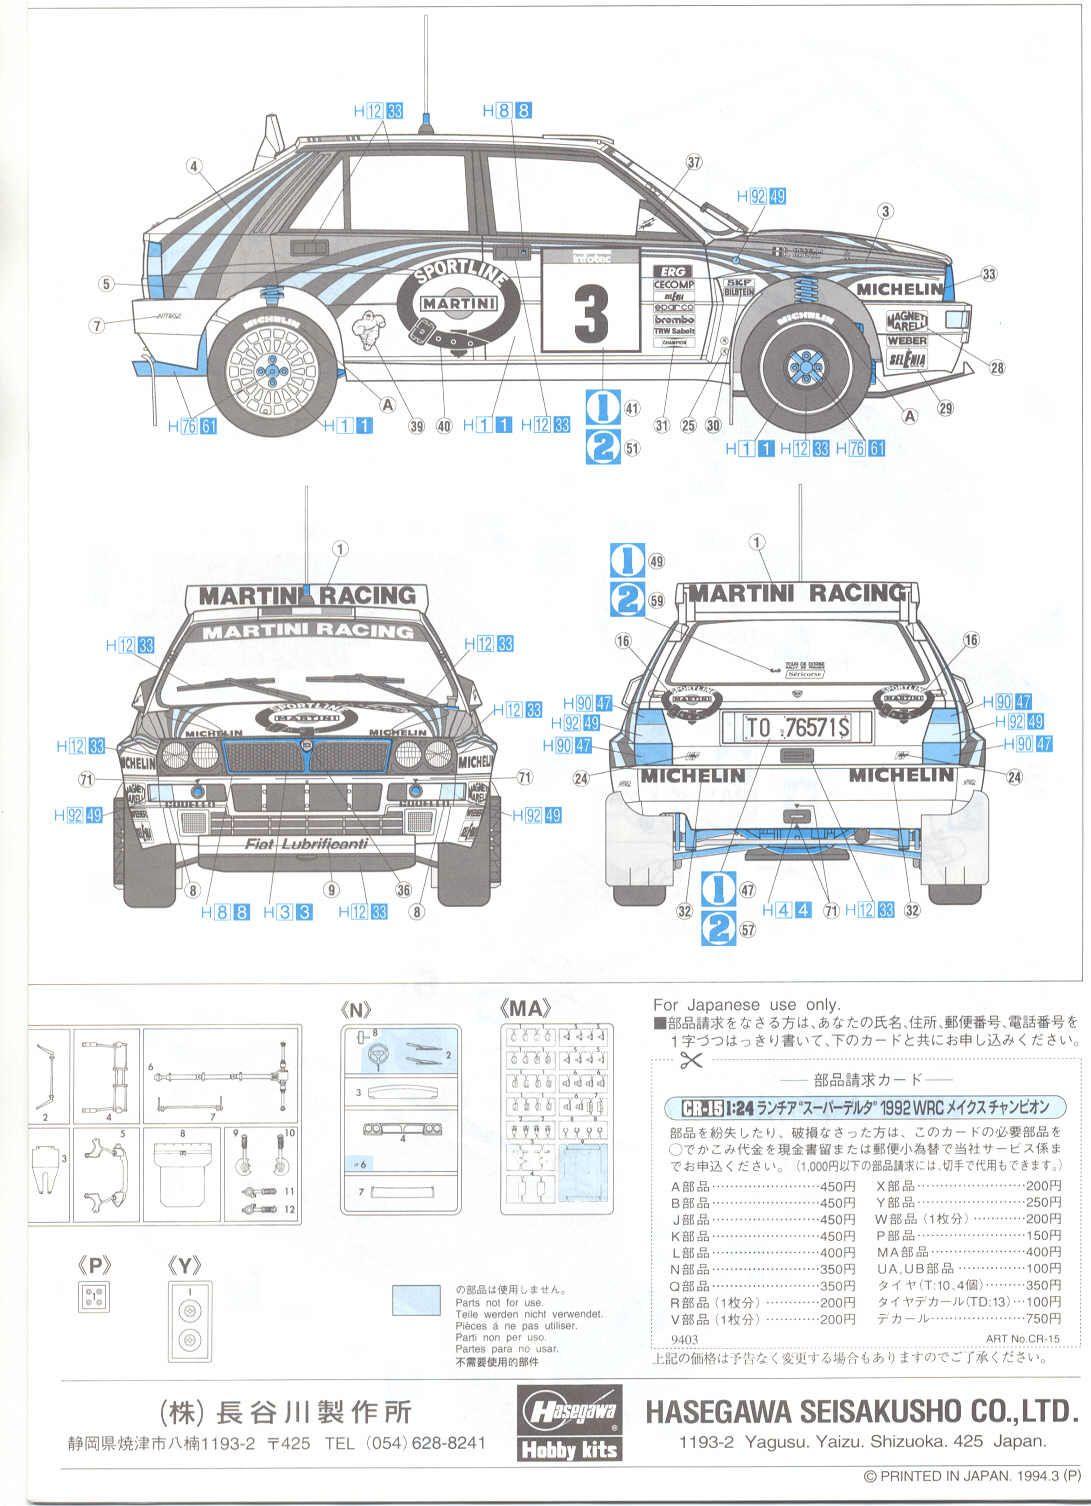 Lancia delta hf integrale 16v 1989 sanremo rally smcars lancia delta hf integrale 16v 1989 sanremo rally smcars car blueprints forum malvernweather Choice Image